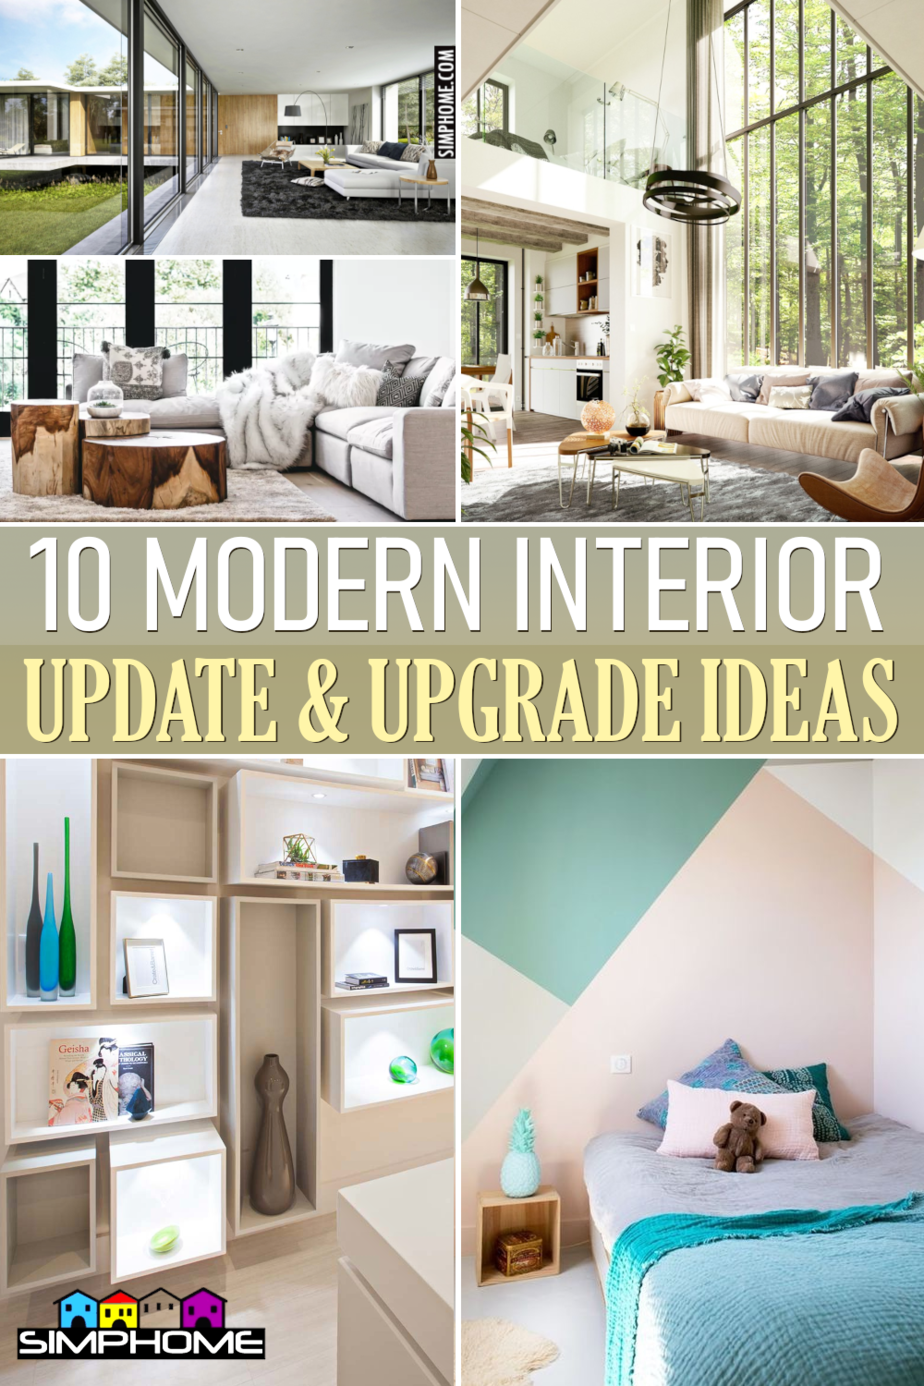 10 Modern Interior Makeover Ideas via Simphome.comFeatured